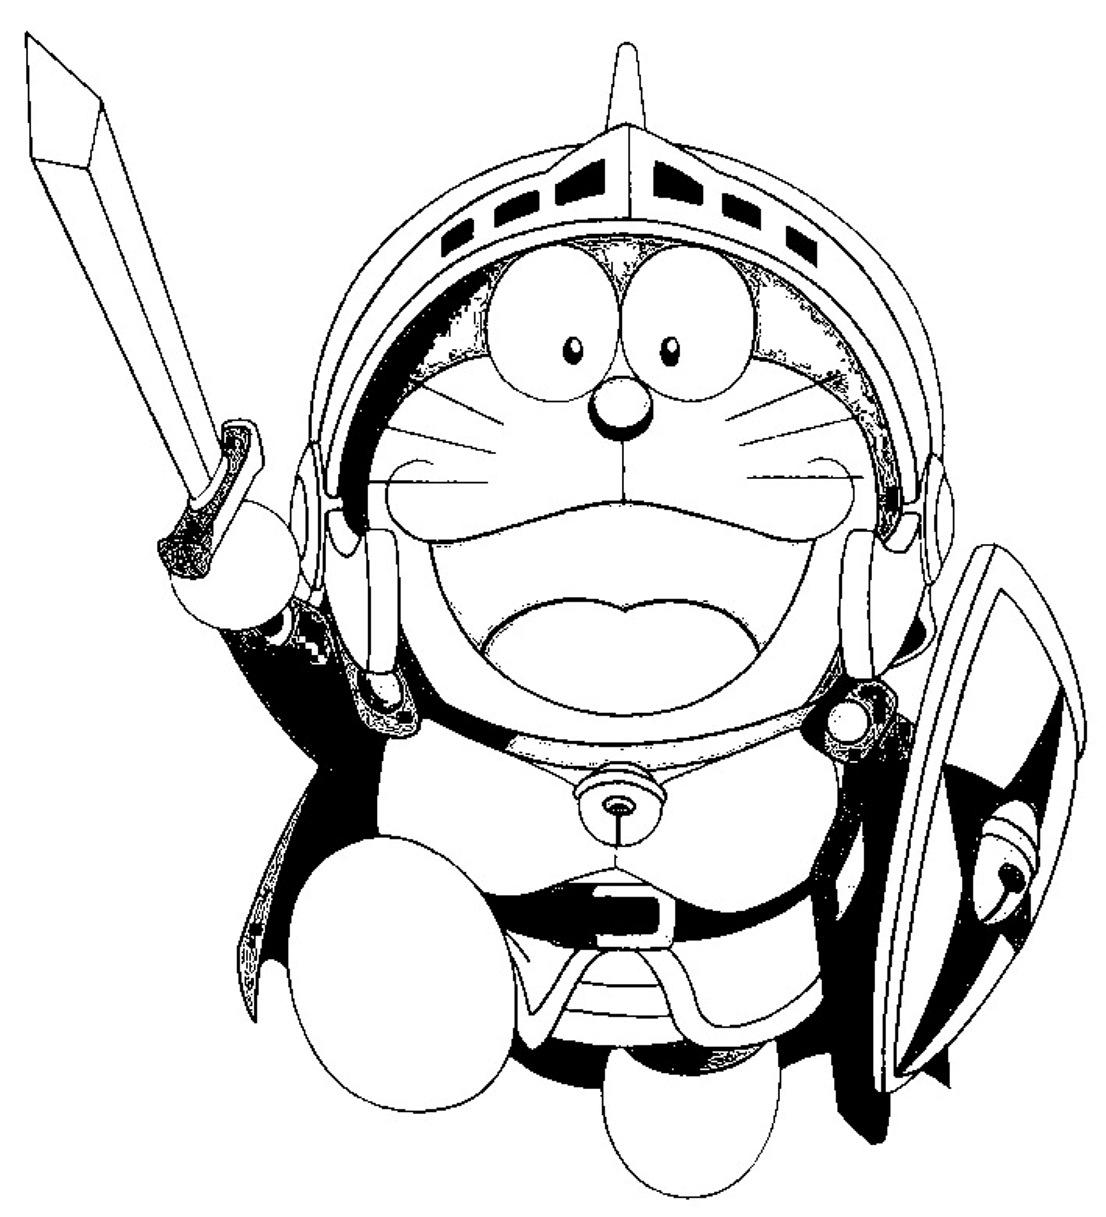 Doraemon The Warrior